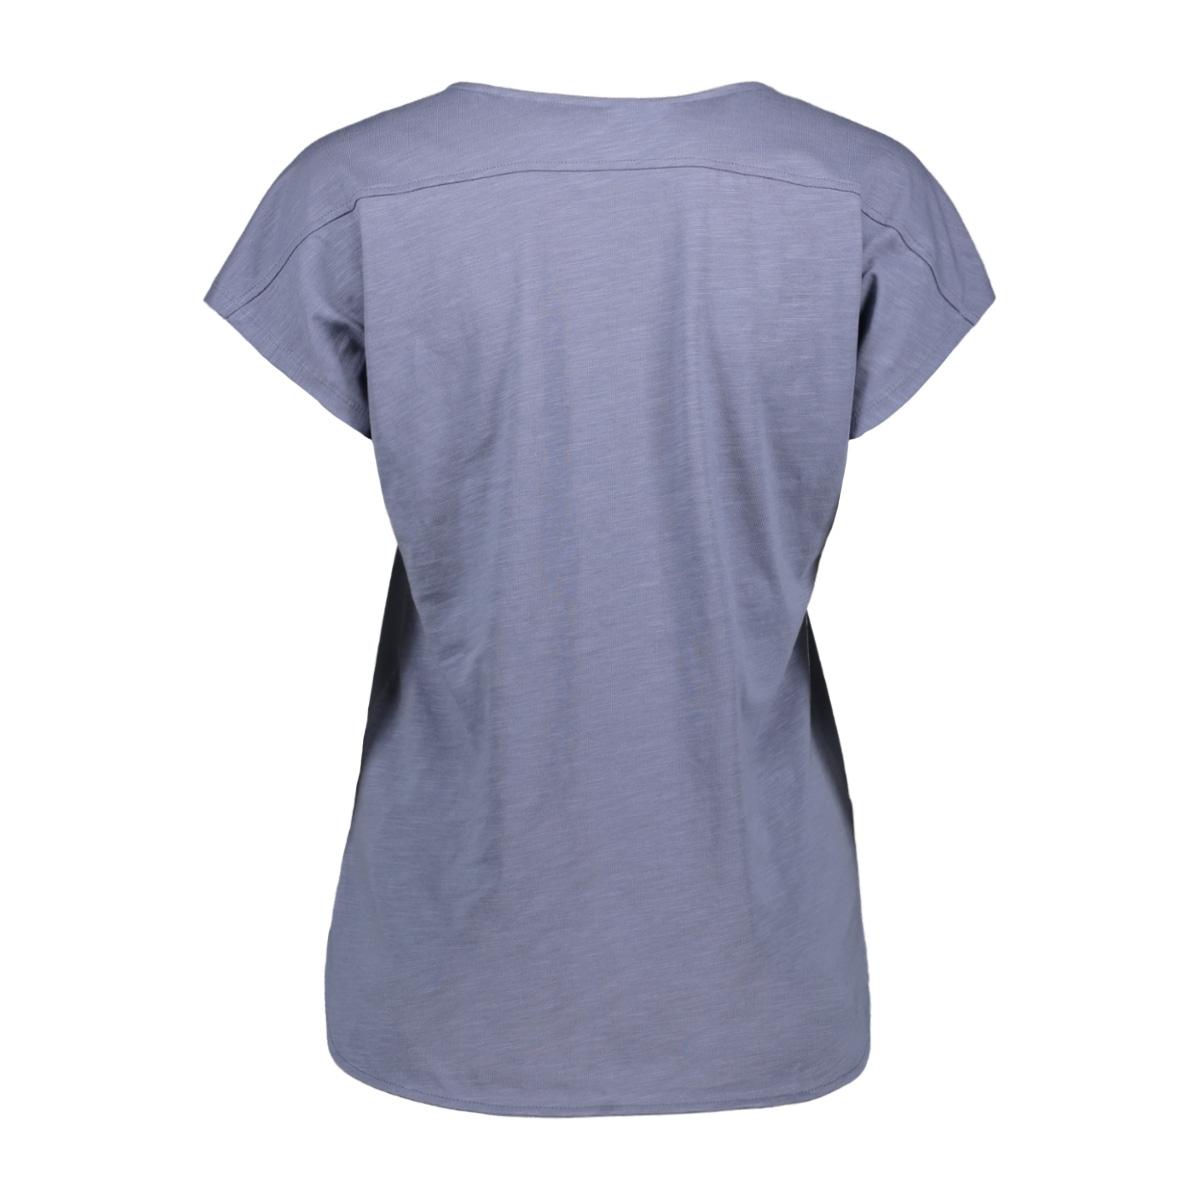 t shirt met korte mouwen 21101863 sandwich t-shirt 41027 blue grey